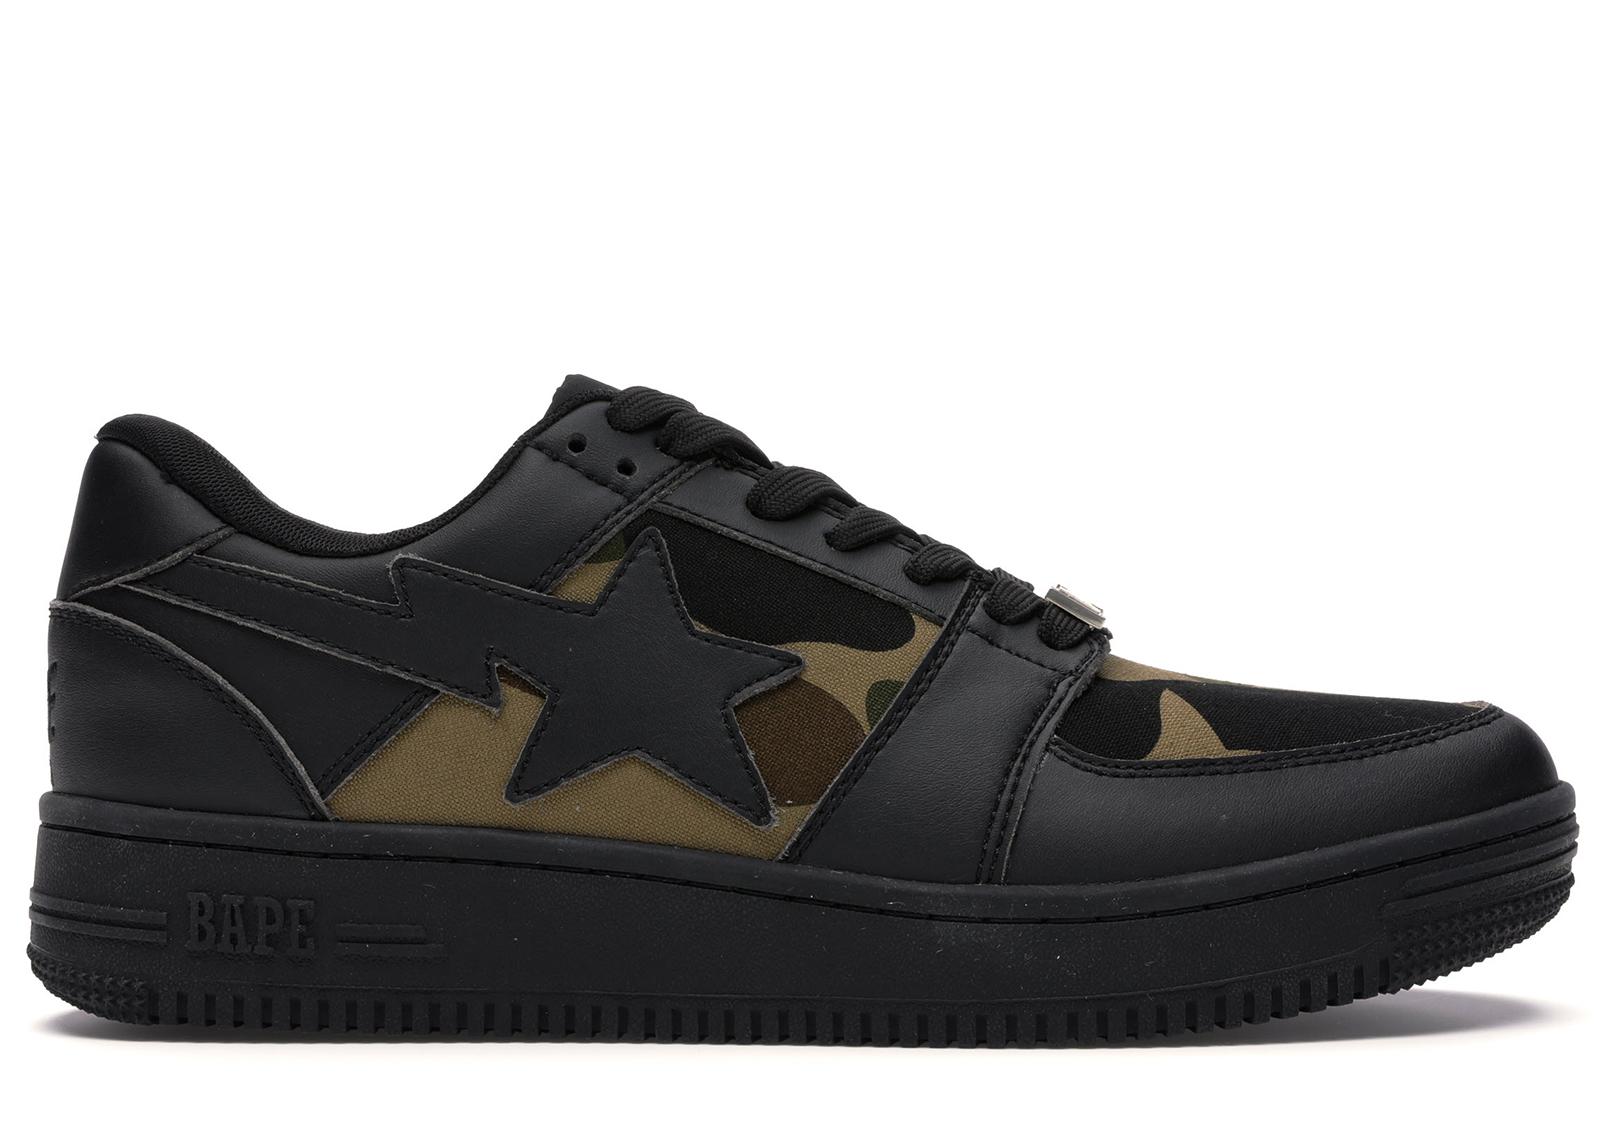 Bape 1st Camo Bape Sta Low Black - Sneakers